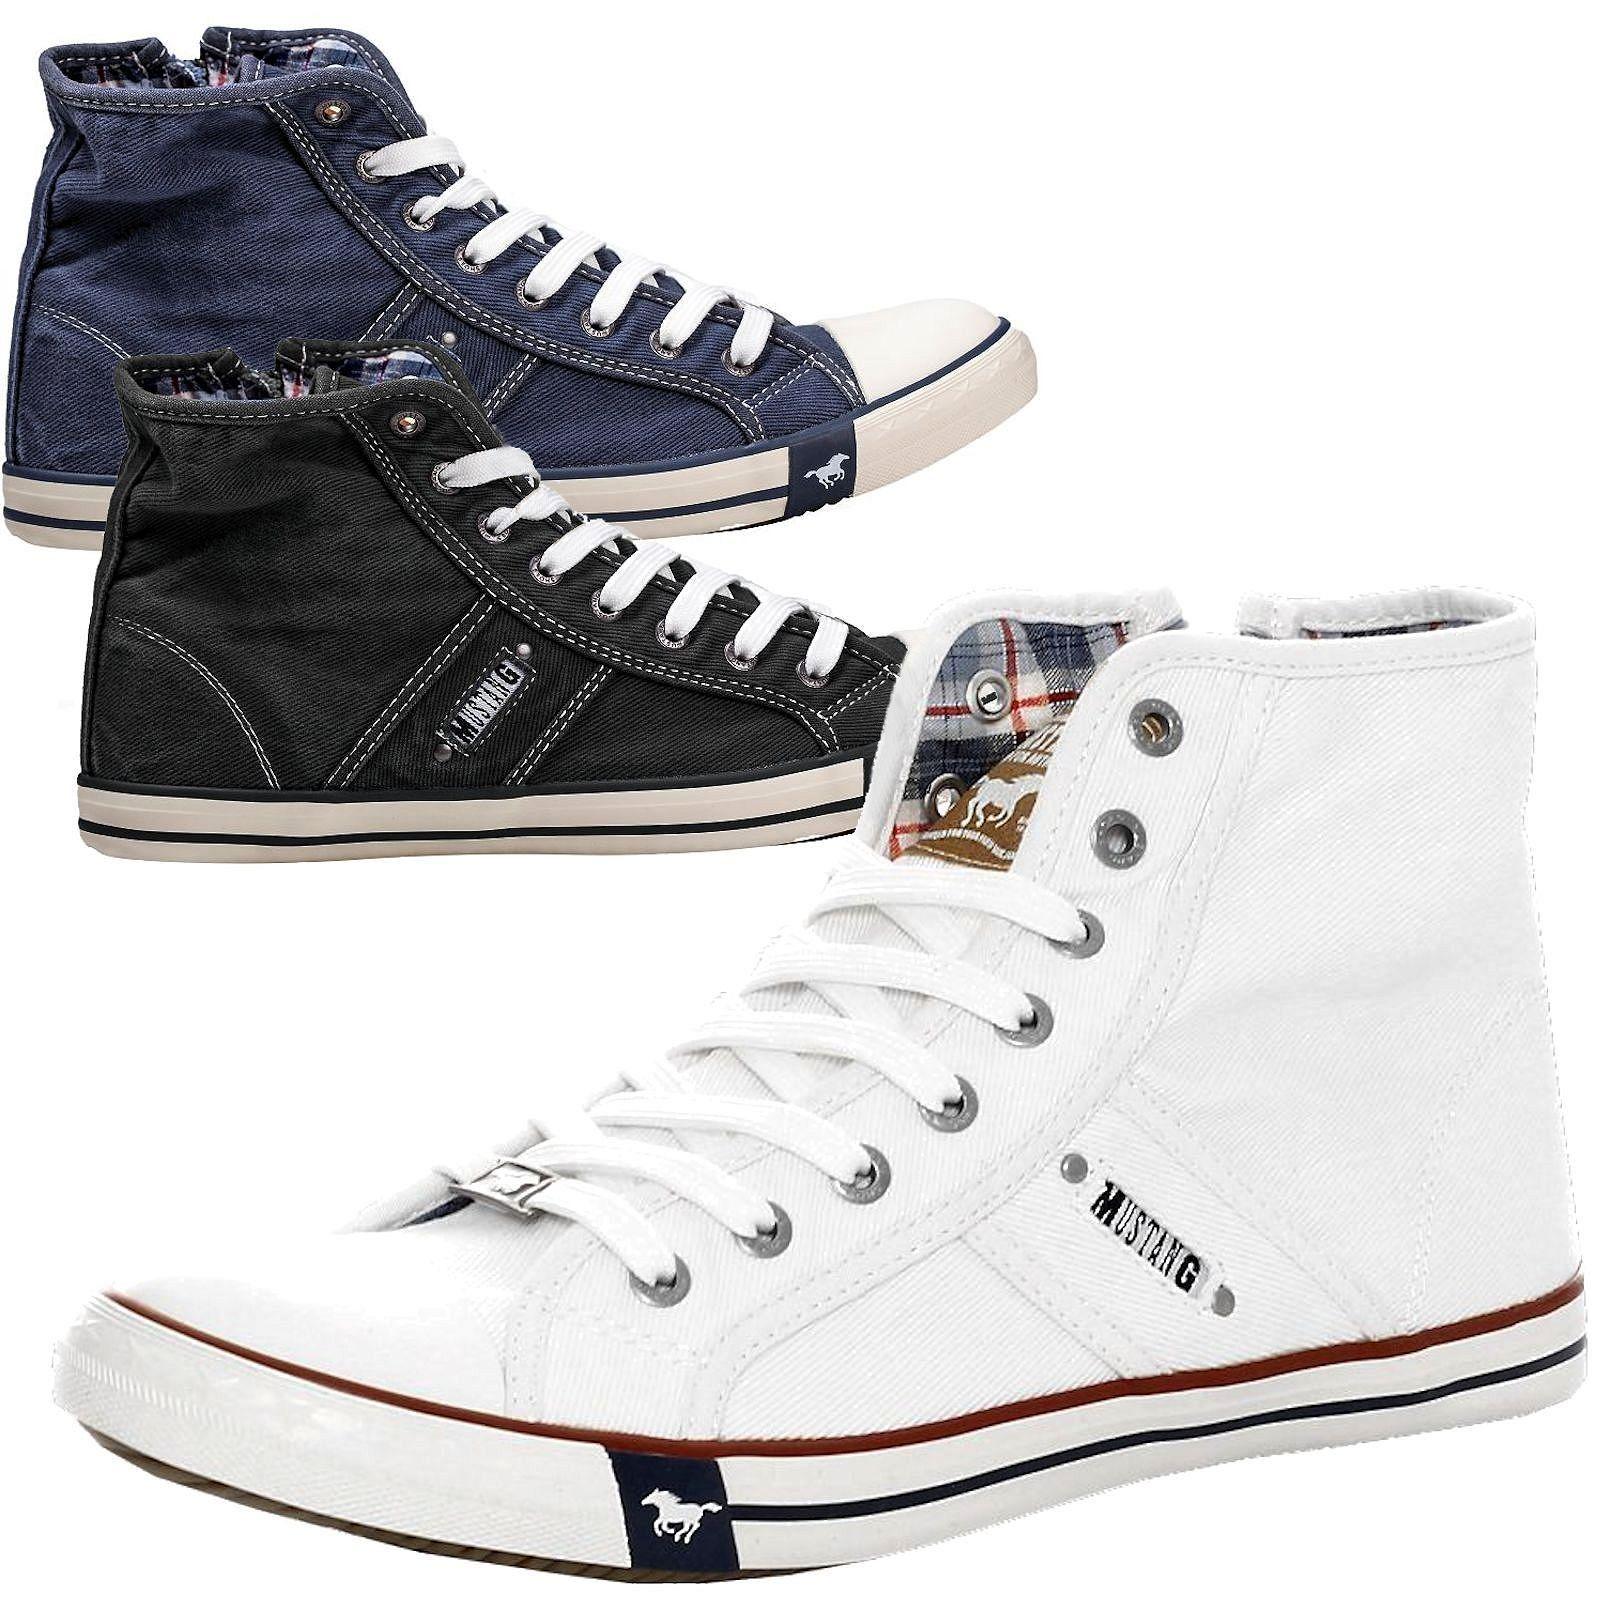 Details zu Mustang Herren Schuhe Herrenschuhe Sneaker Turnschuhe Freizeitschuhe 4058 504